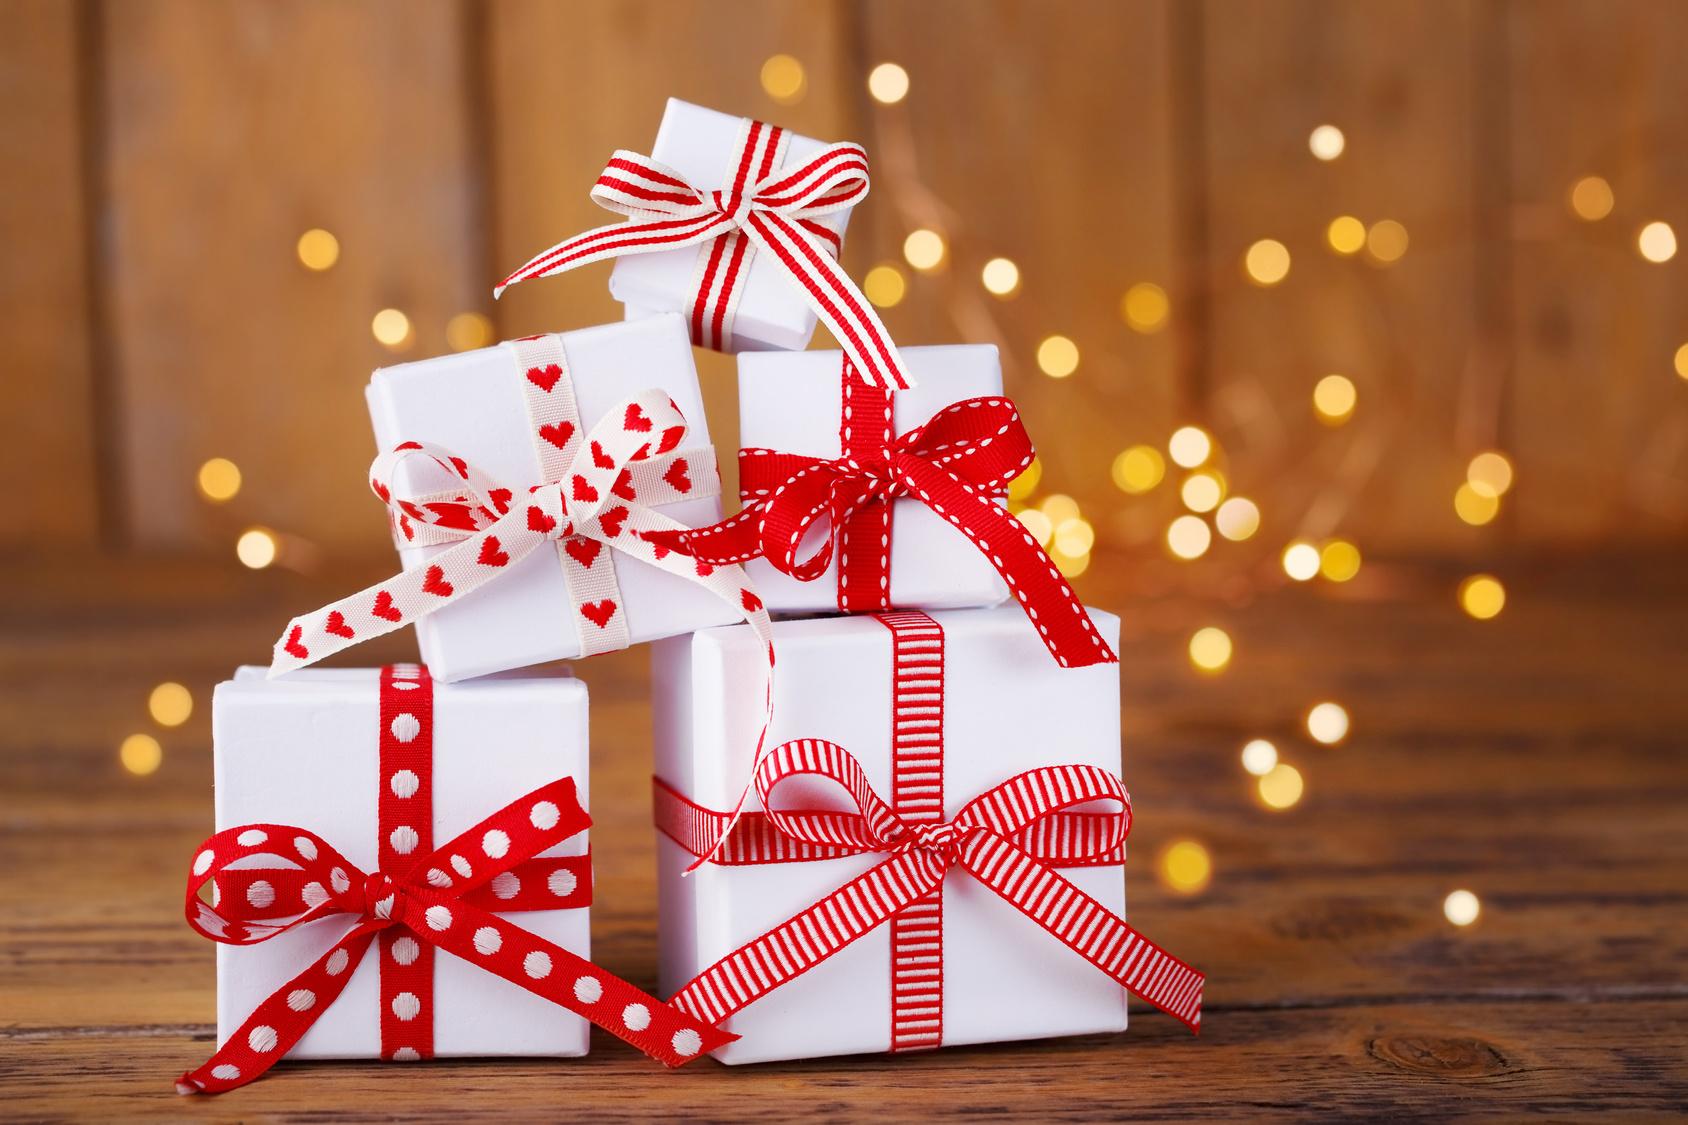 Pflegeprodukte & Geschenkideen